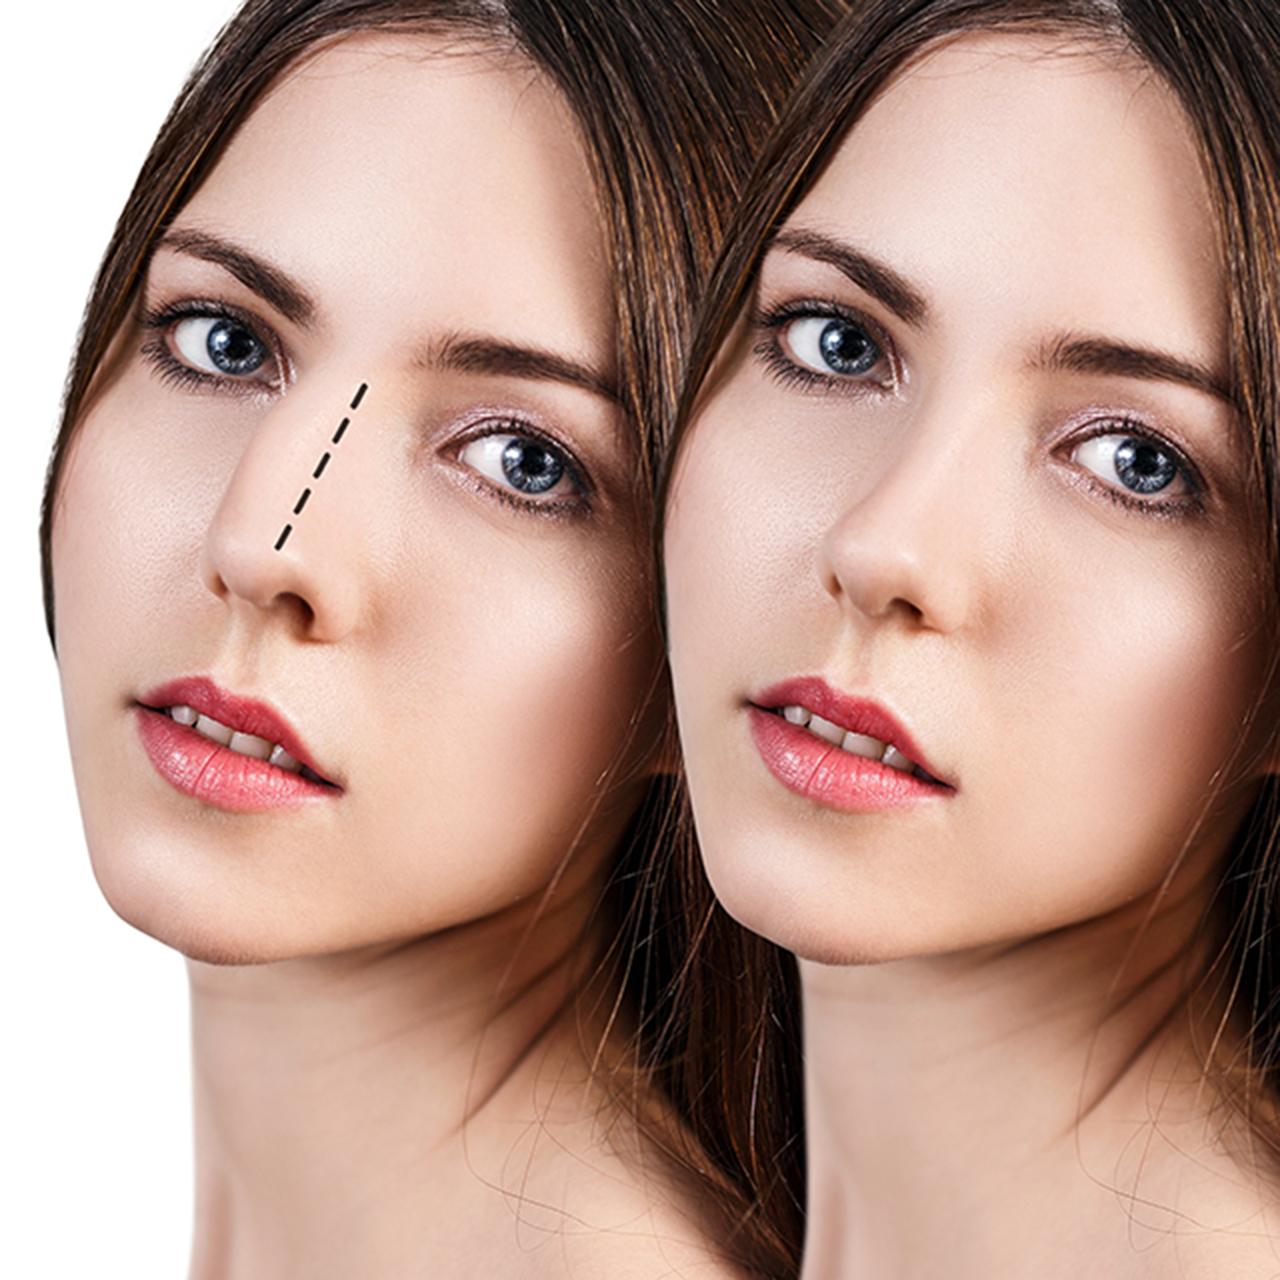 rhinoplasty nose job